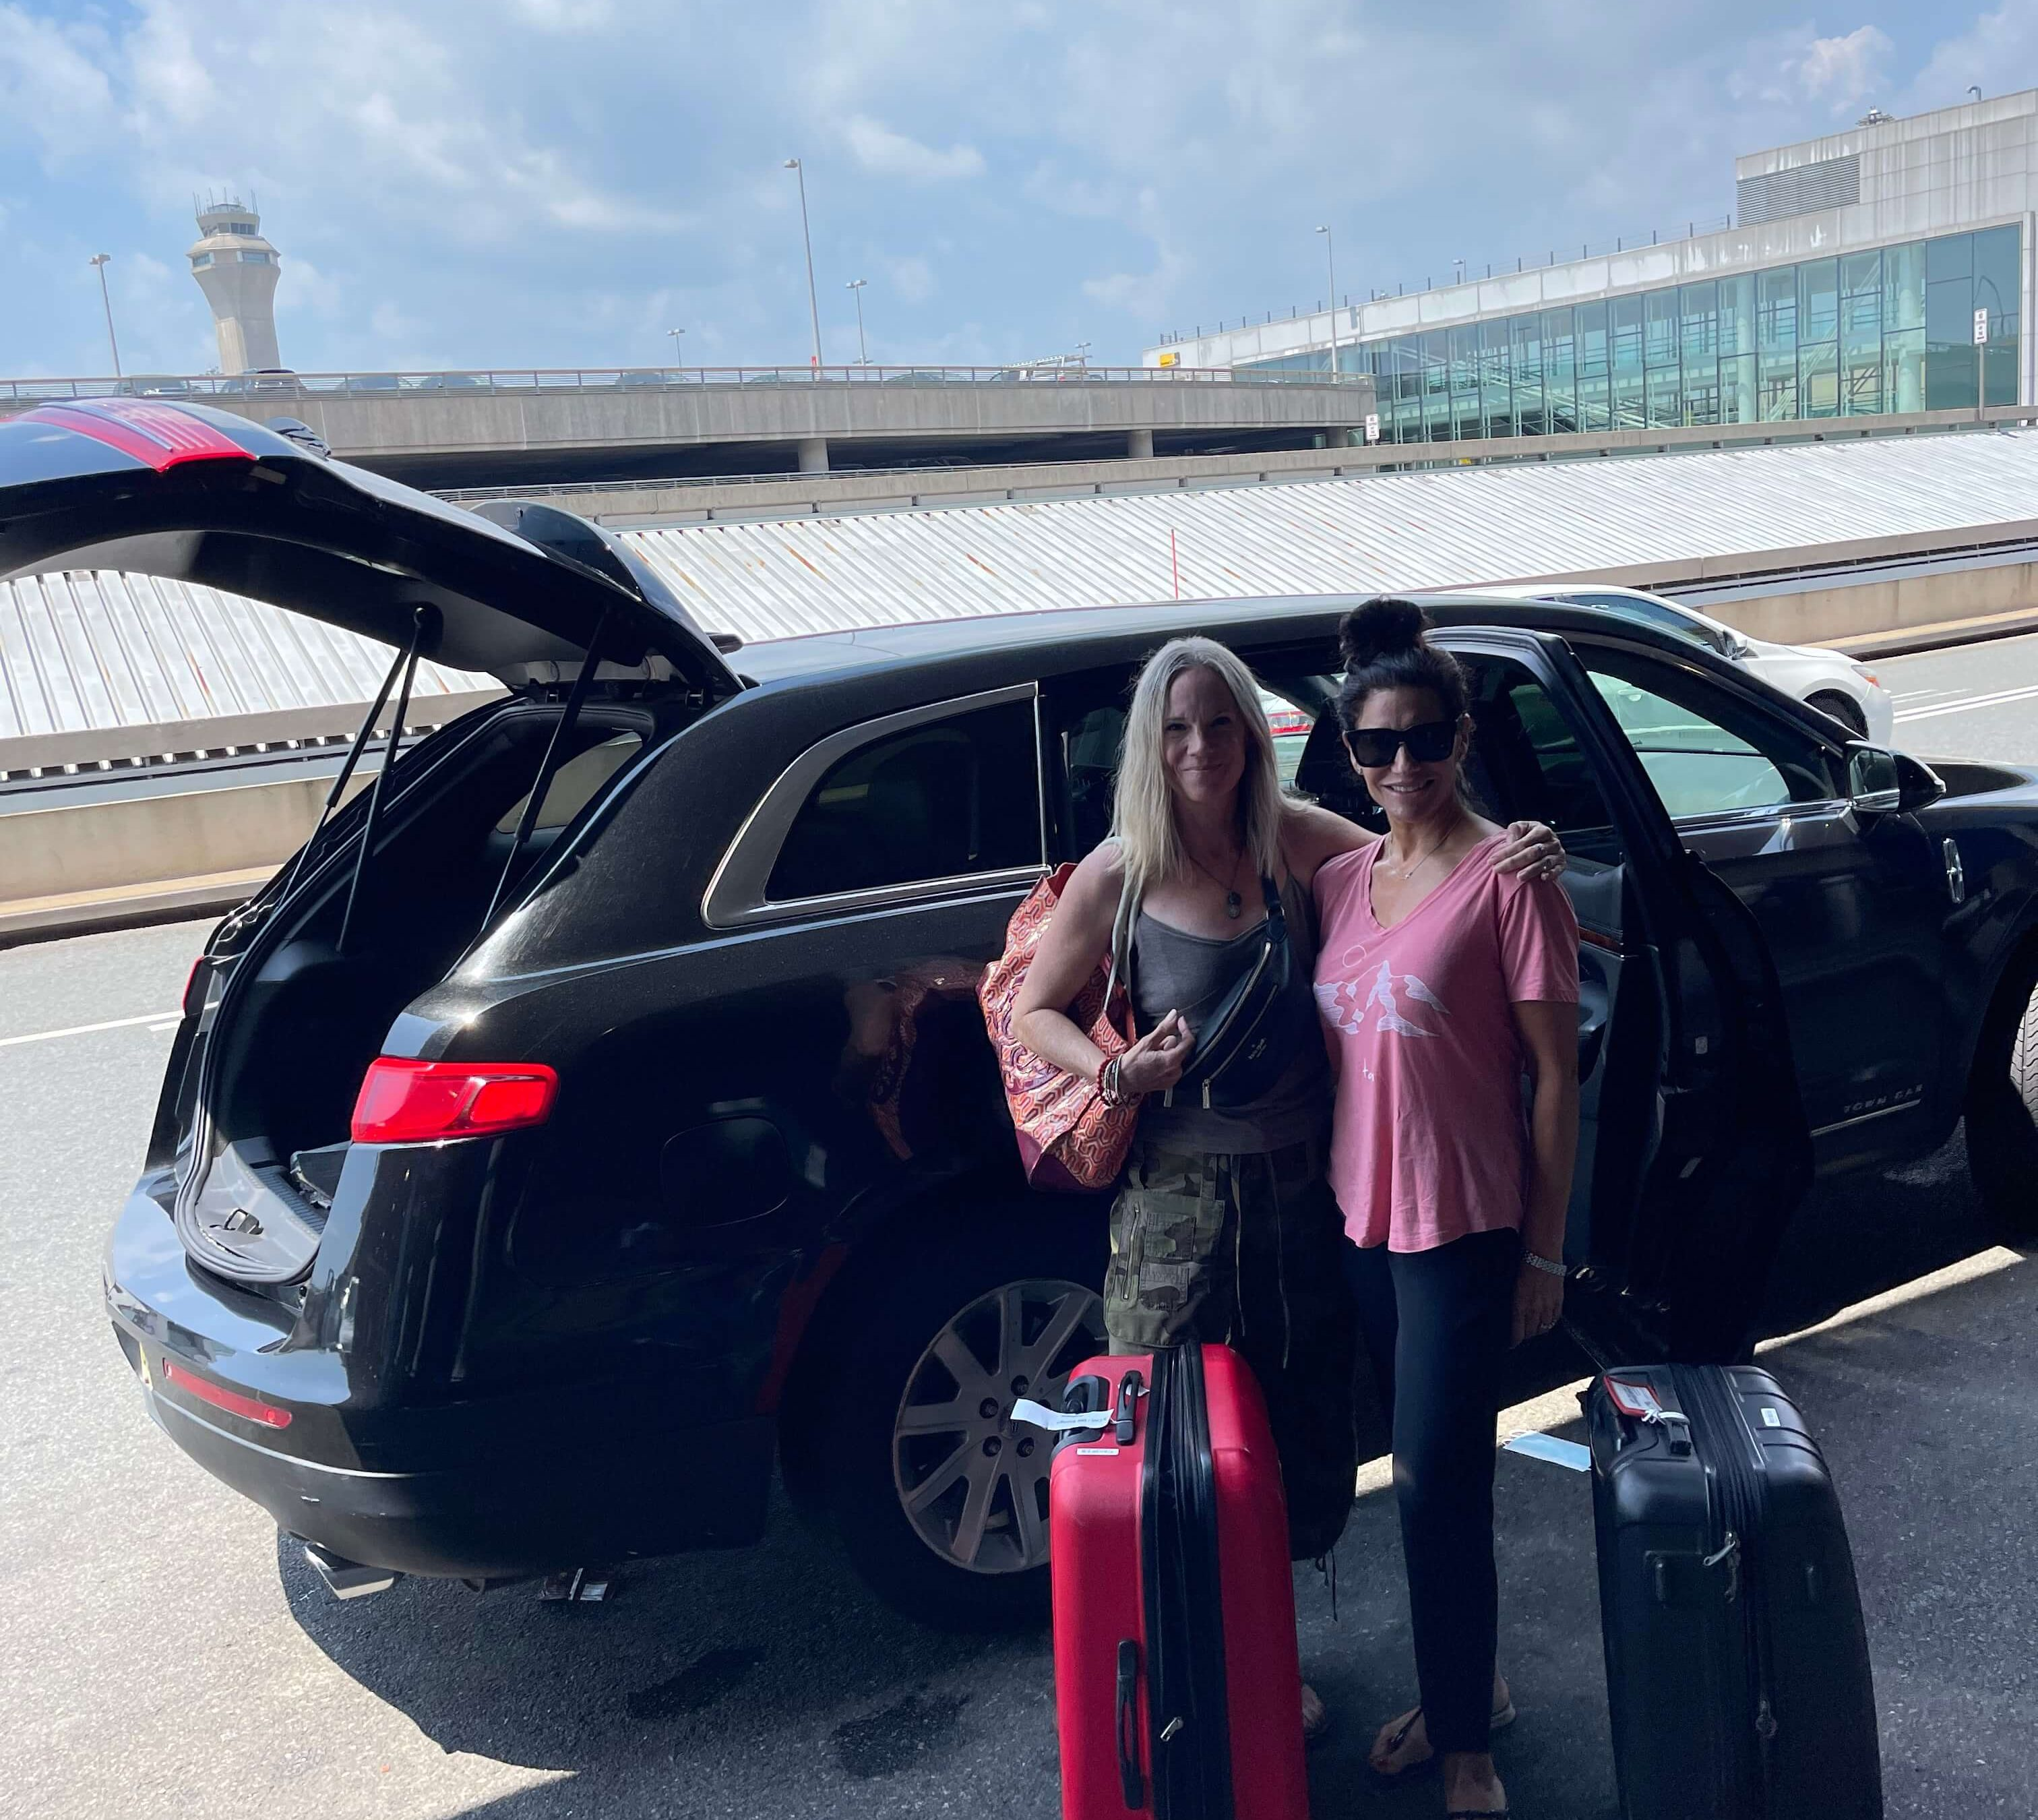 car service in Newark Airport